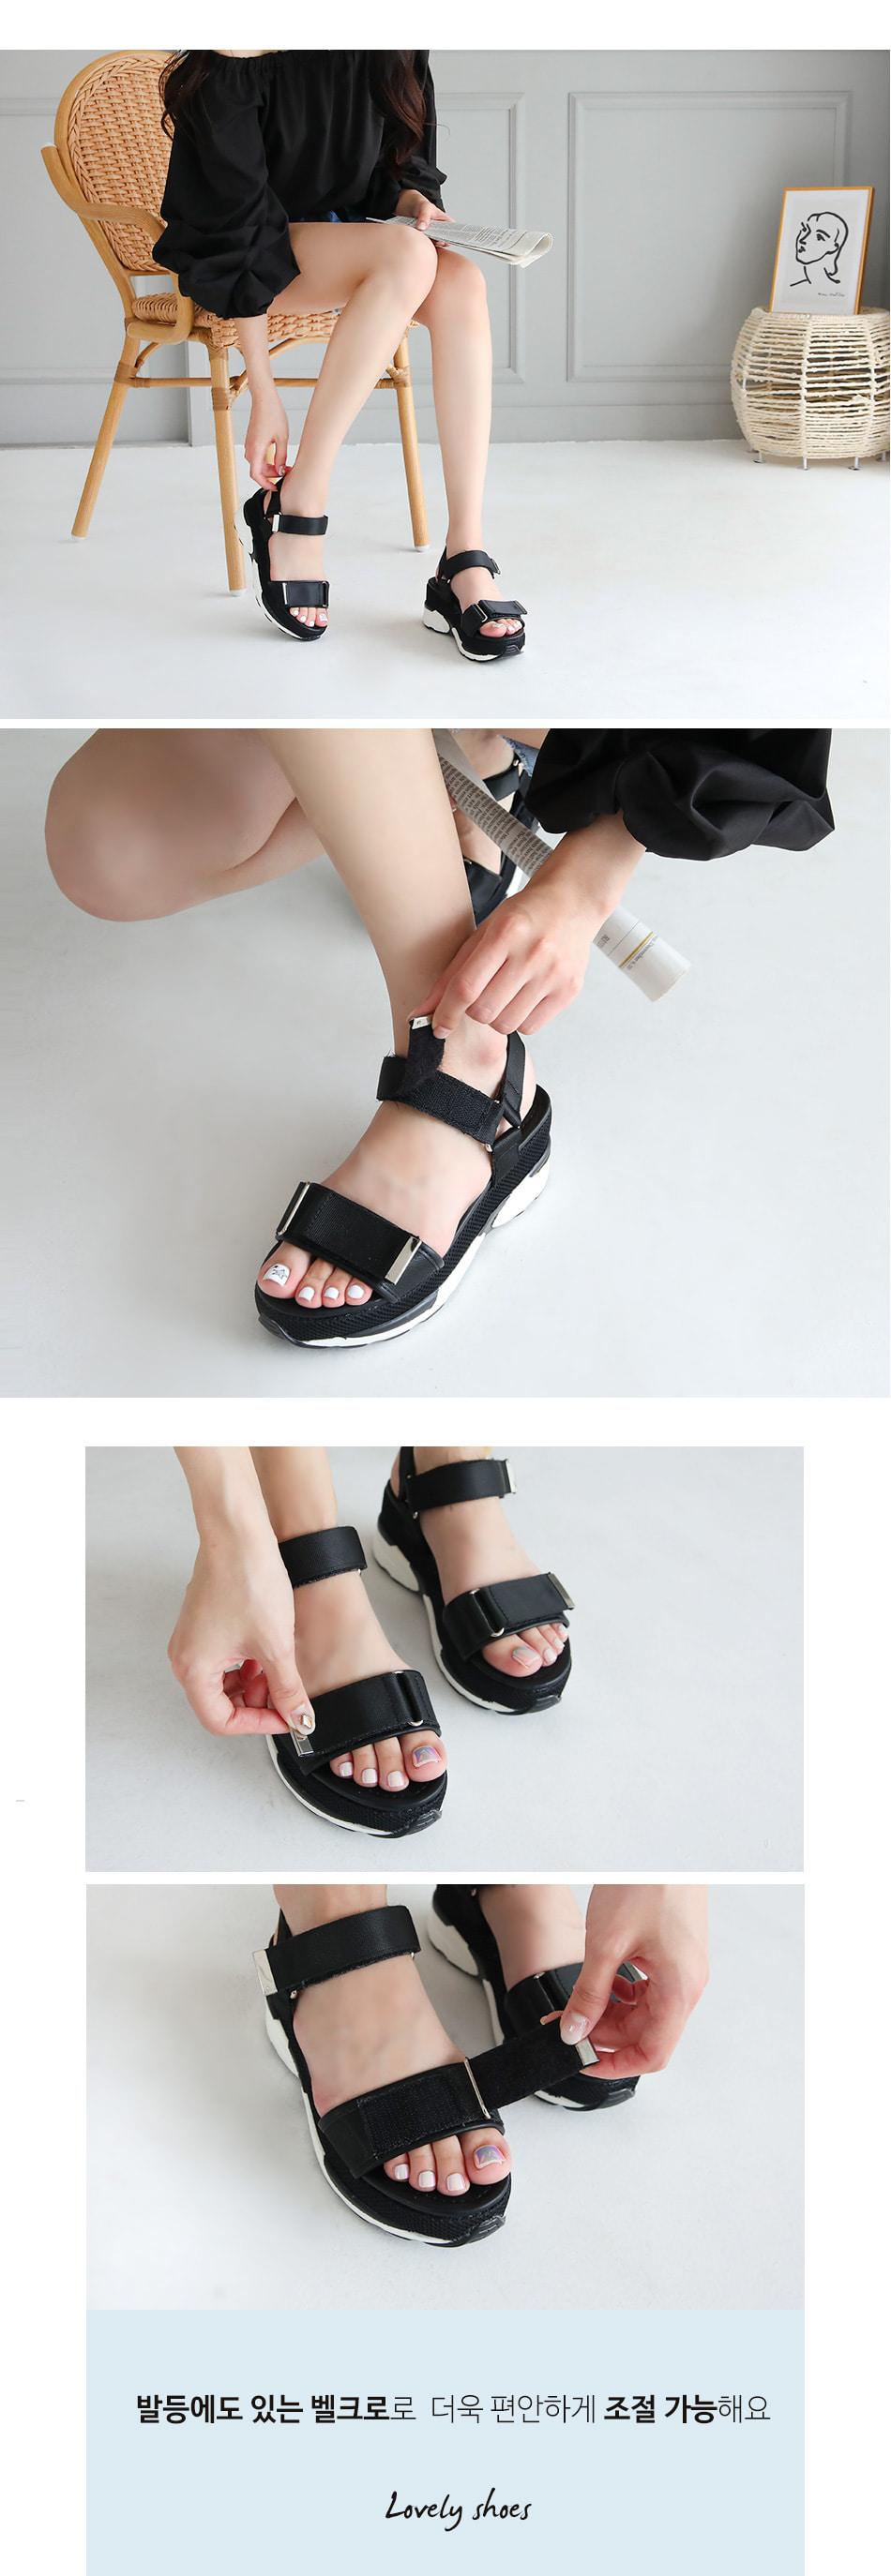 Revent Velcro Tongue Sandal 6cm